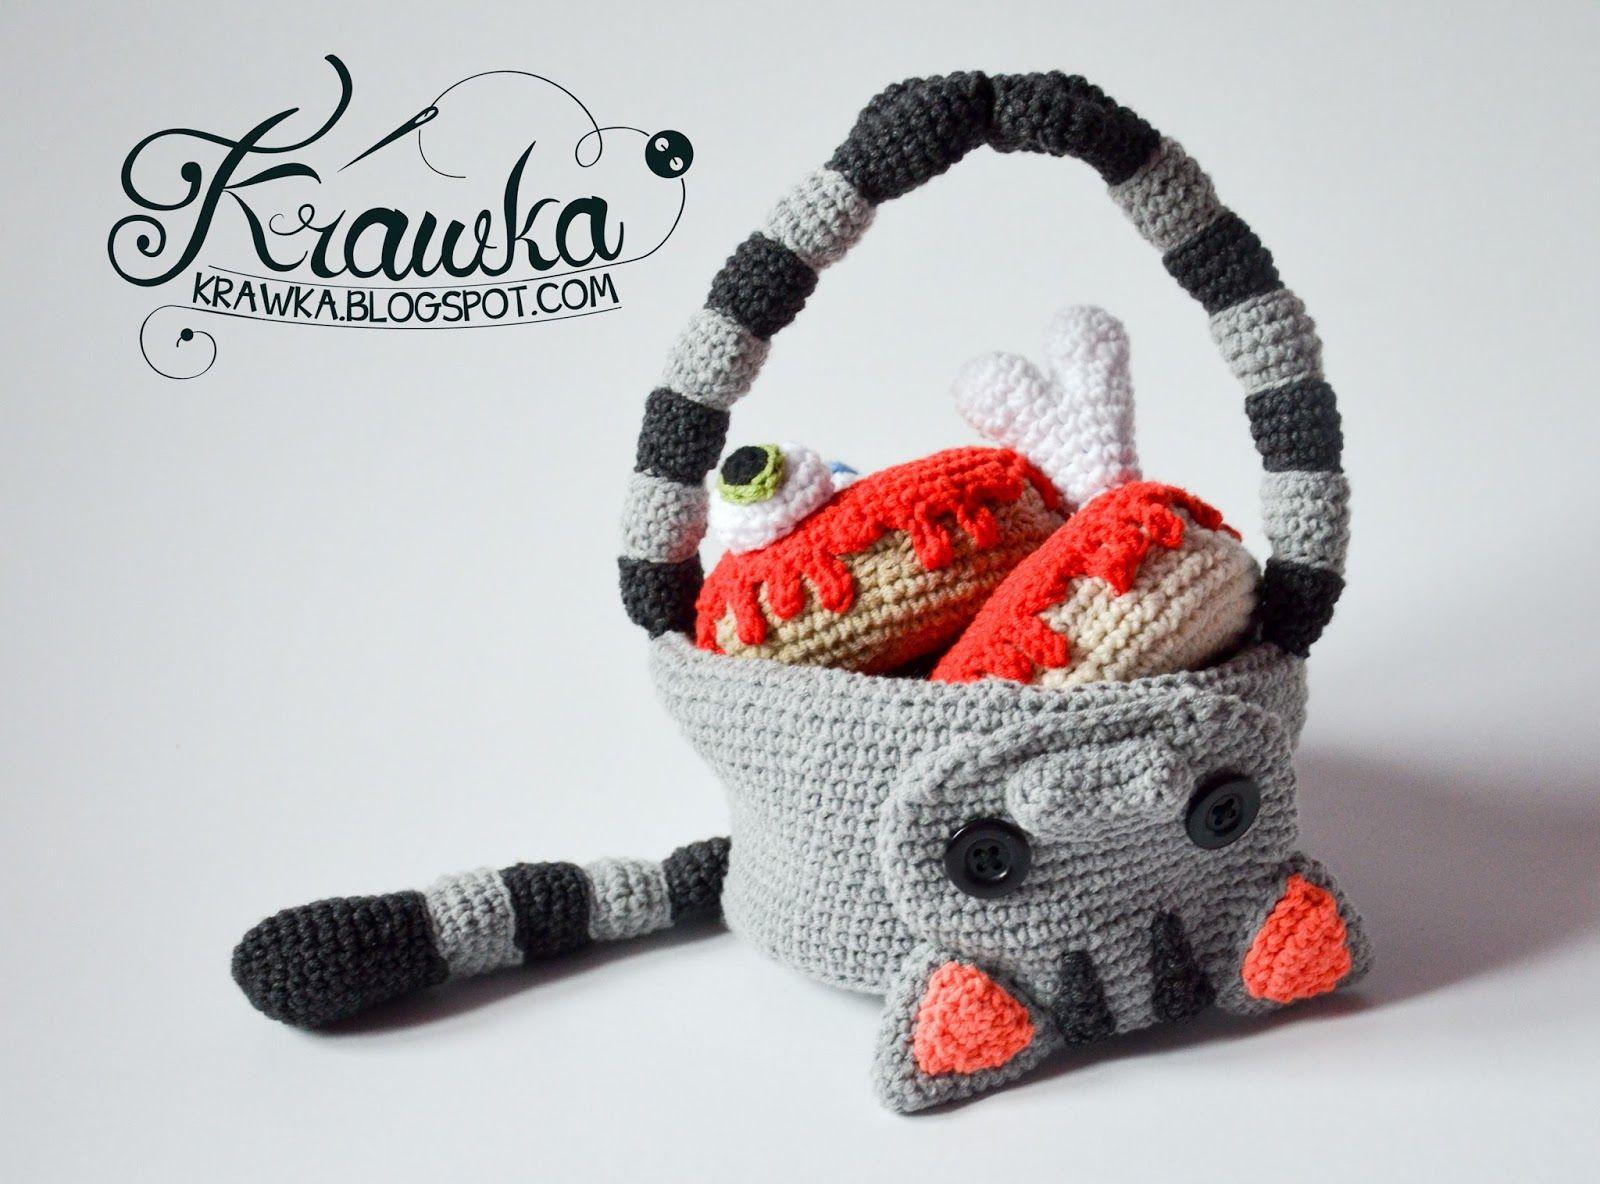 Krawka: Donuts free crochet patterns. Regular donut with pink icing ...